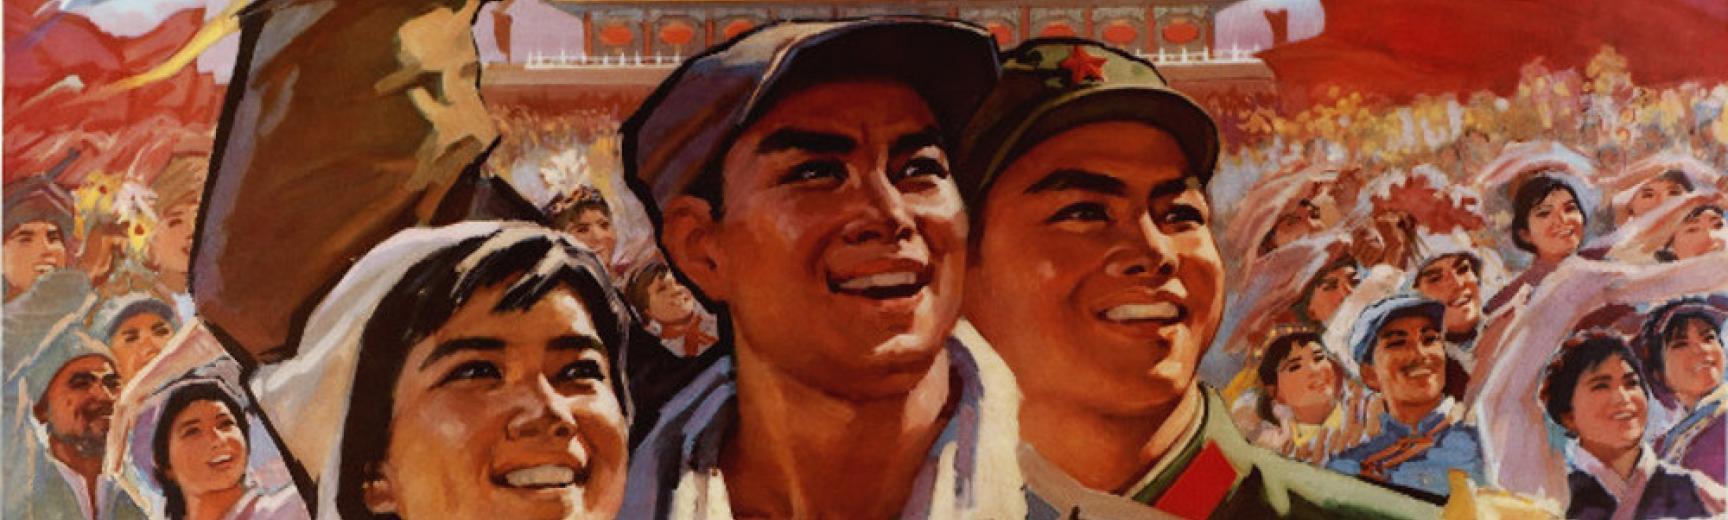 Ashmolean Touring Exhibitions - Cultural Revolution